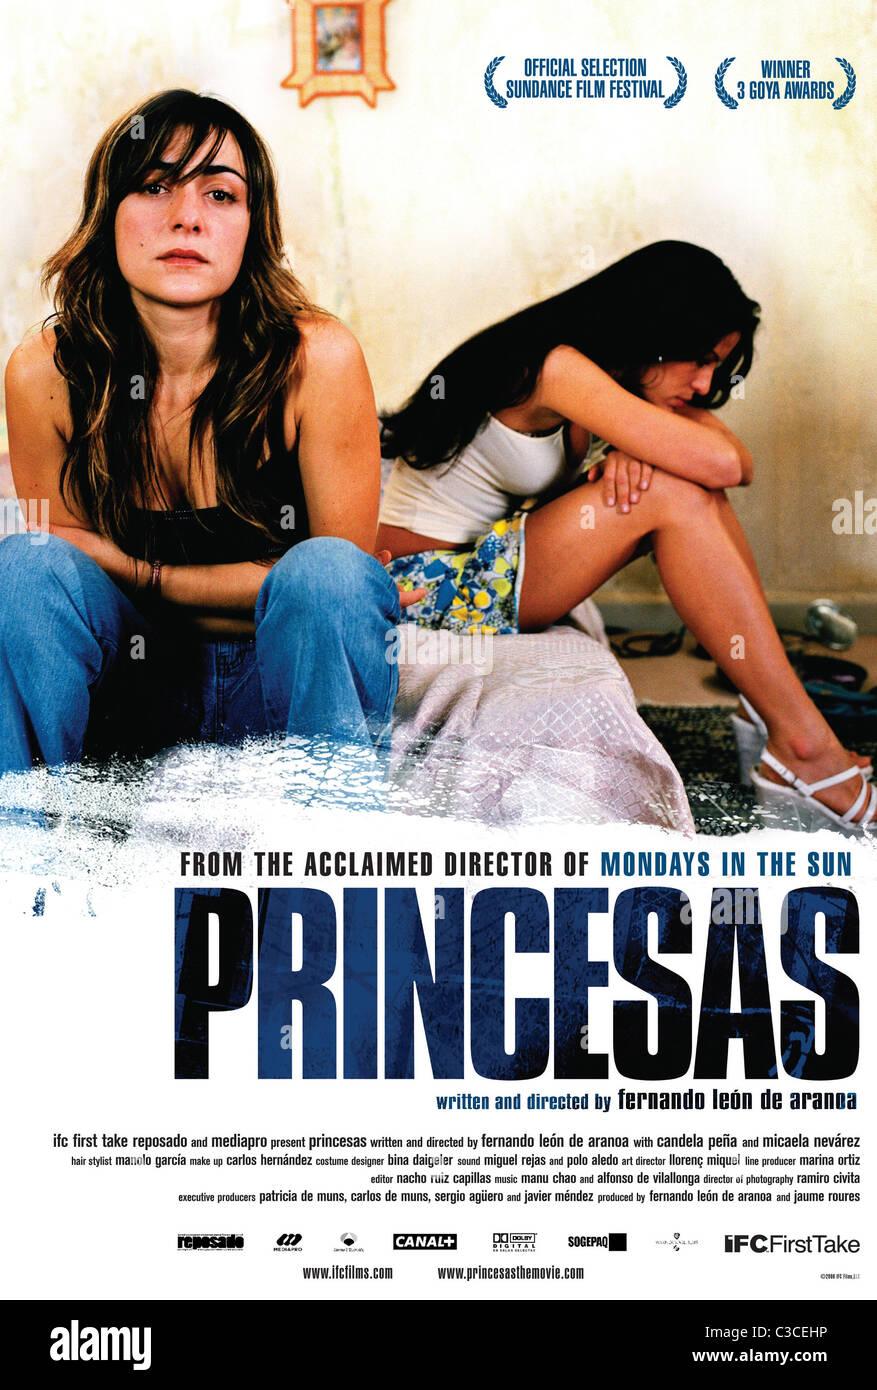 CANDELA PENA & MICAELA NEVAREZ POSTER PRINCESAS (2005) - Stock Image